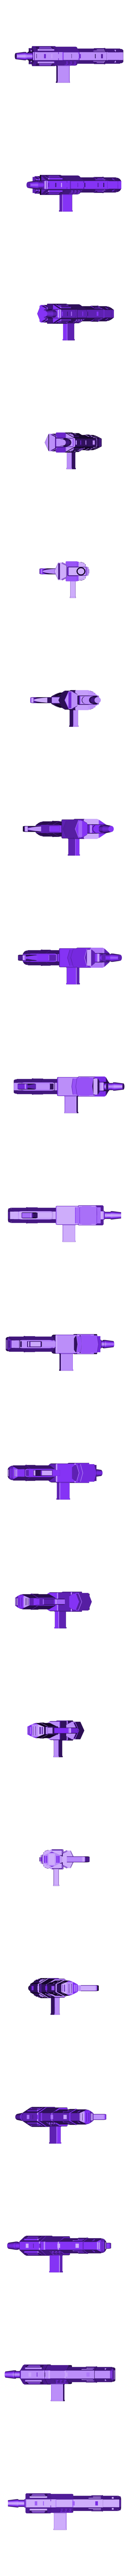 Blaster_Rifle.stl Download free STL file Republic Commandos Blasters • 3D printing design, mrhers2